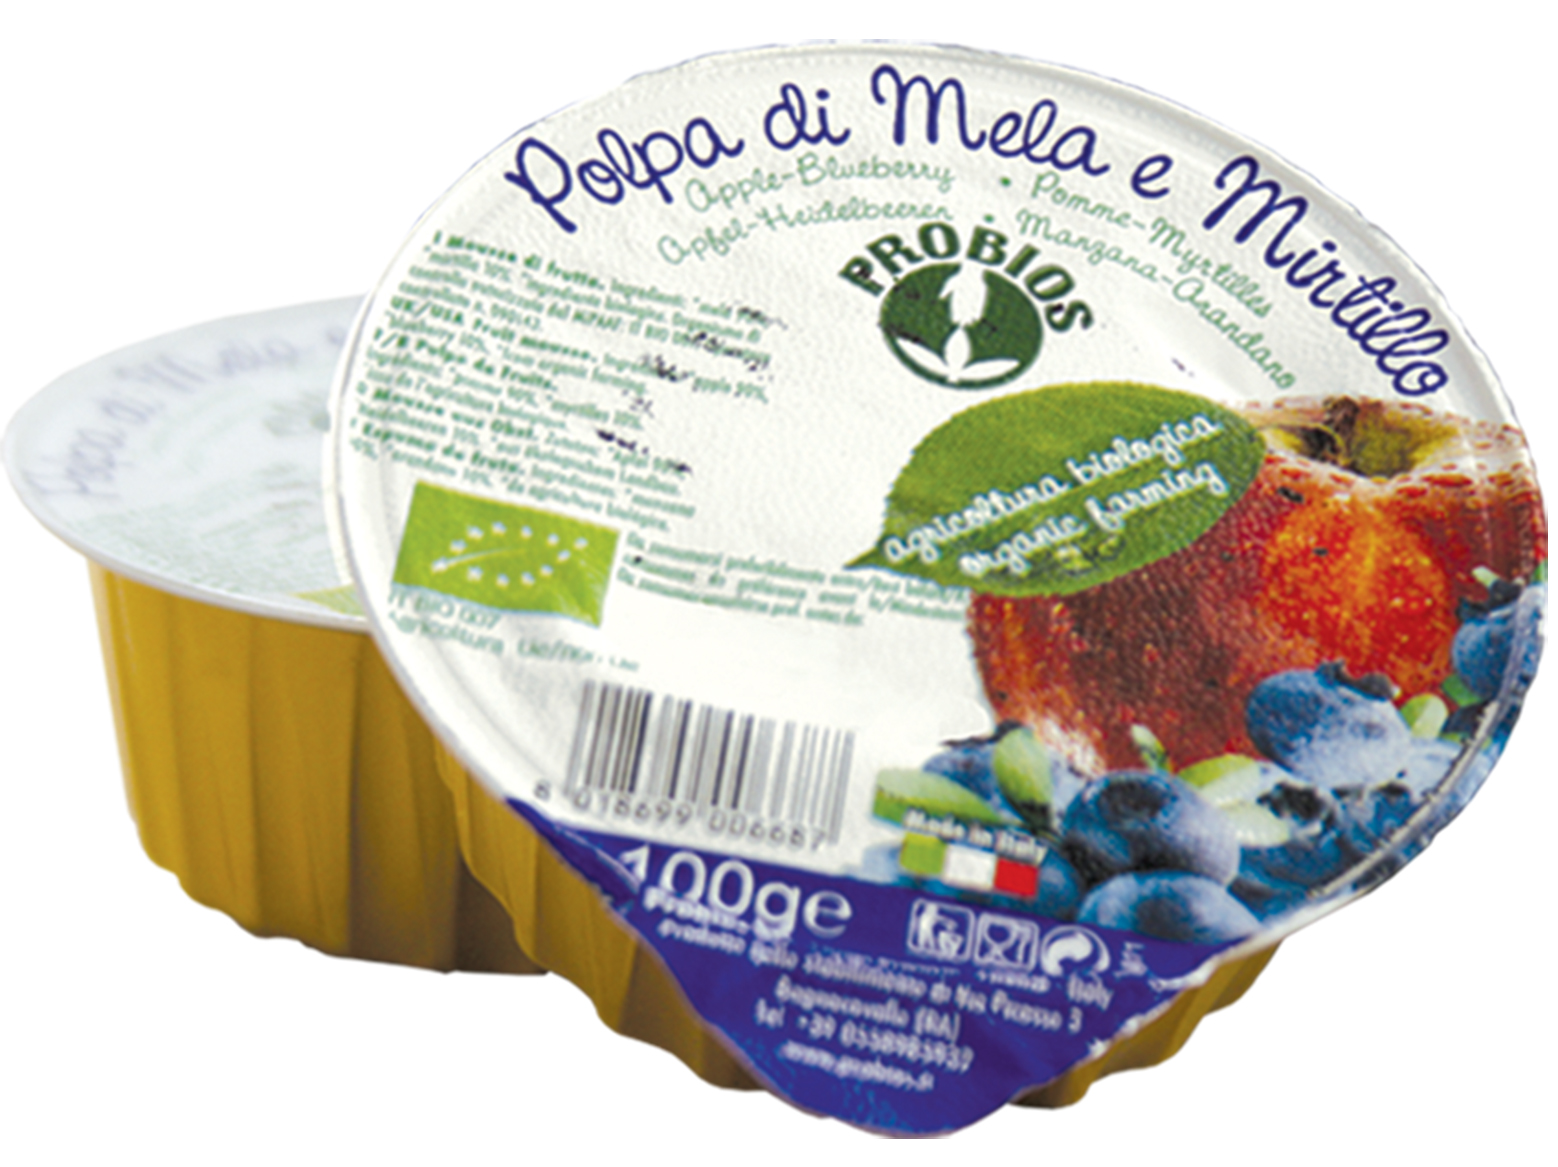 Priobios Frutta Polpa Di Mela E Mirtillo Biologica 100g